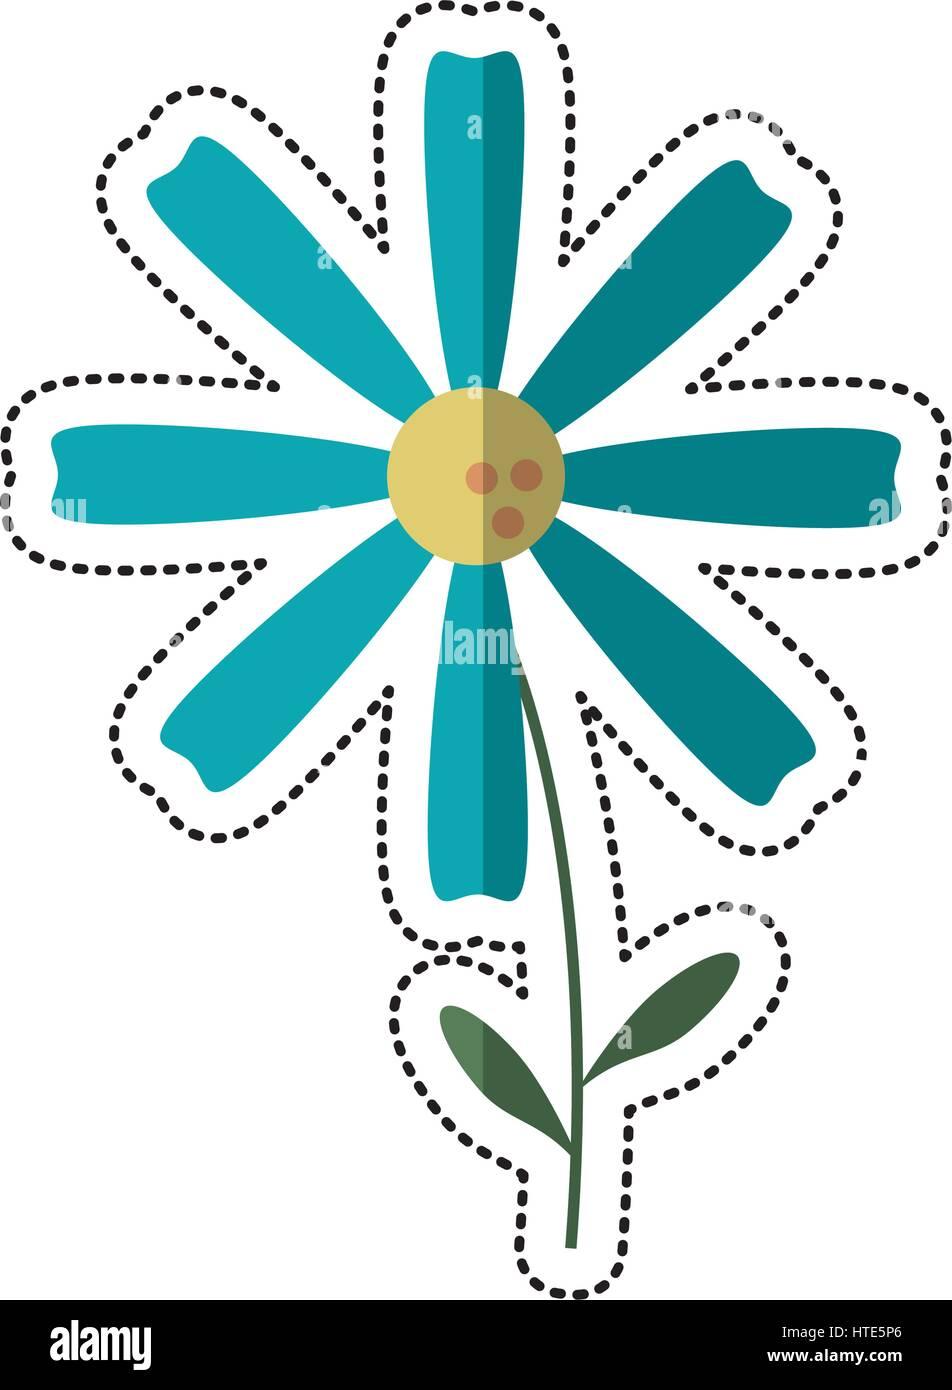 Cartoon daisy flower image stock photos cartoon daisy flower image cartoon daisy flower decoration image stock image izmirmasajfo